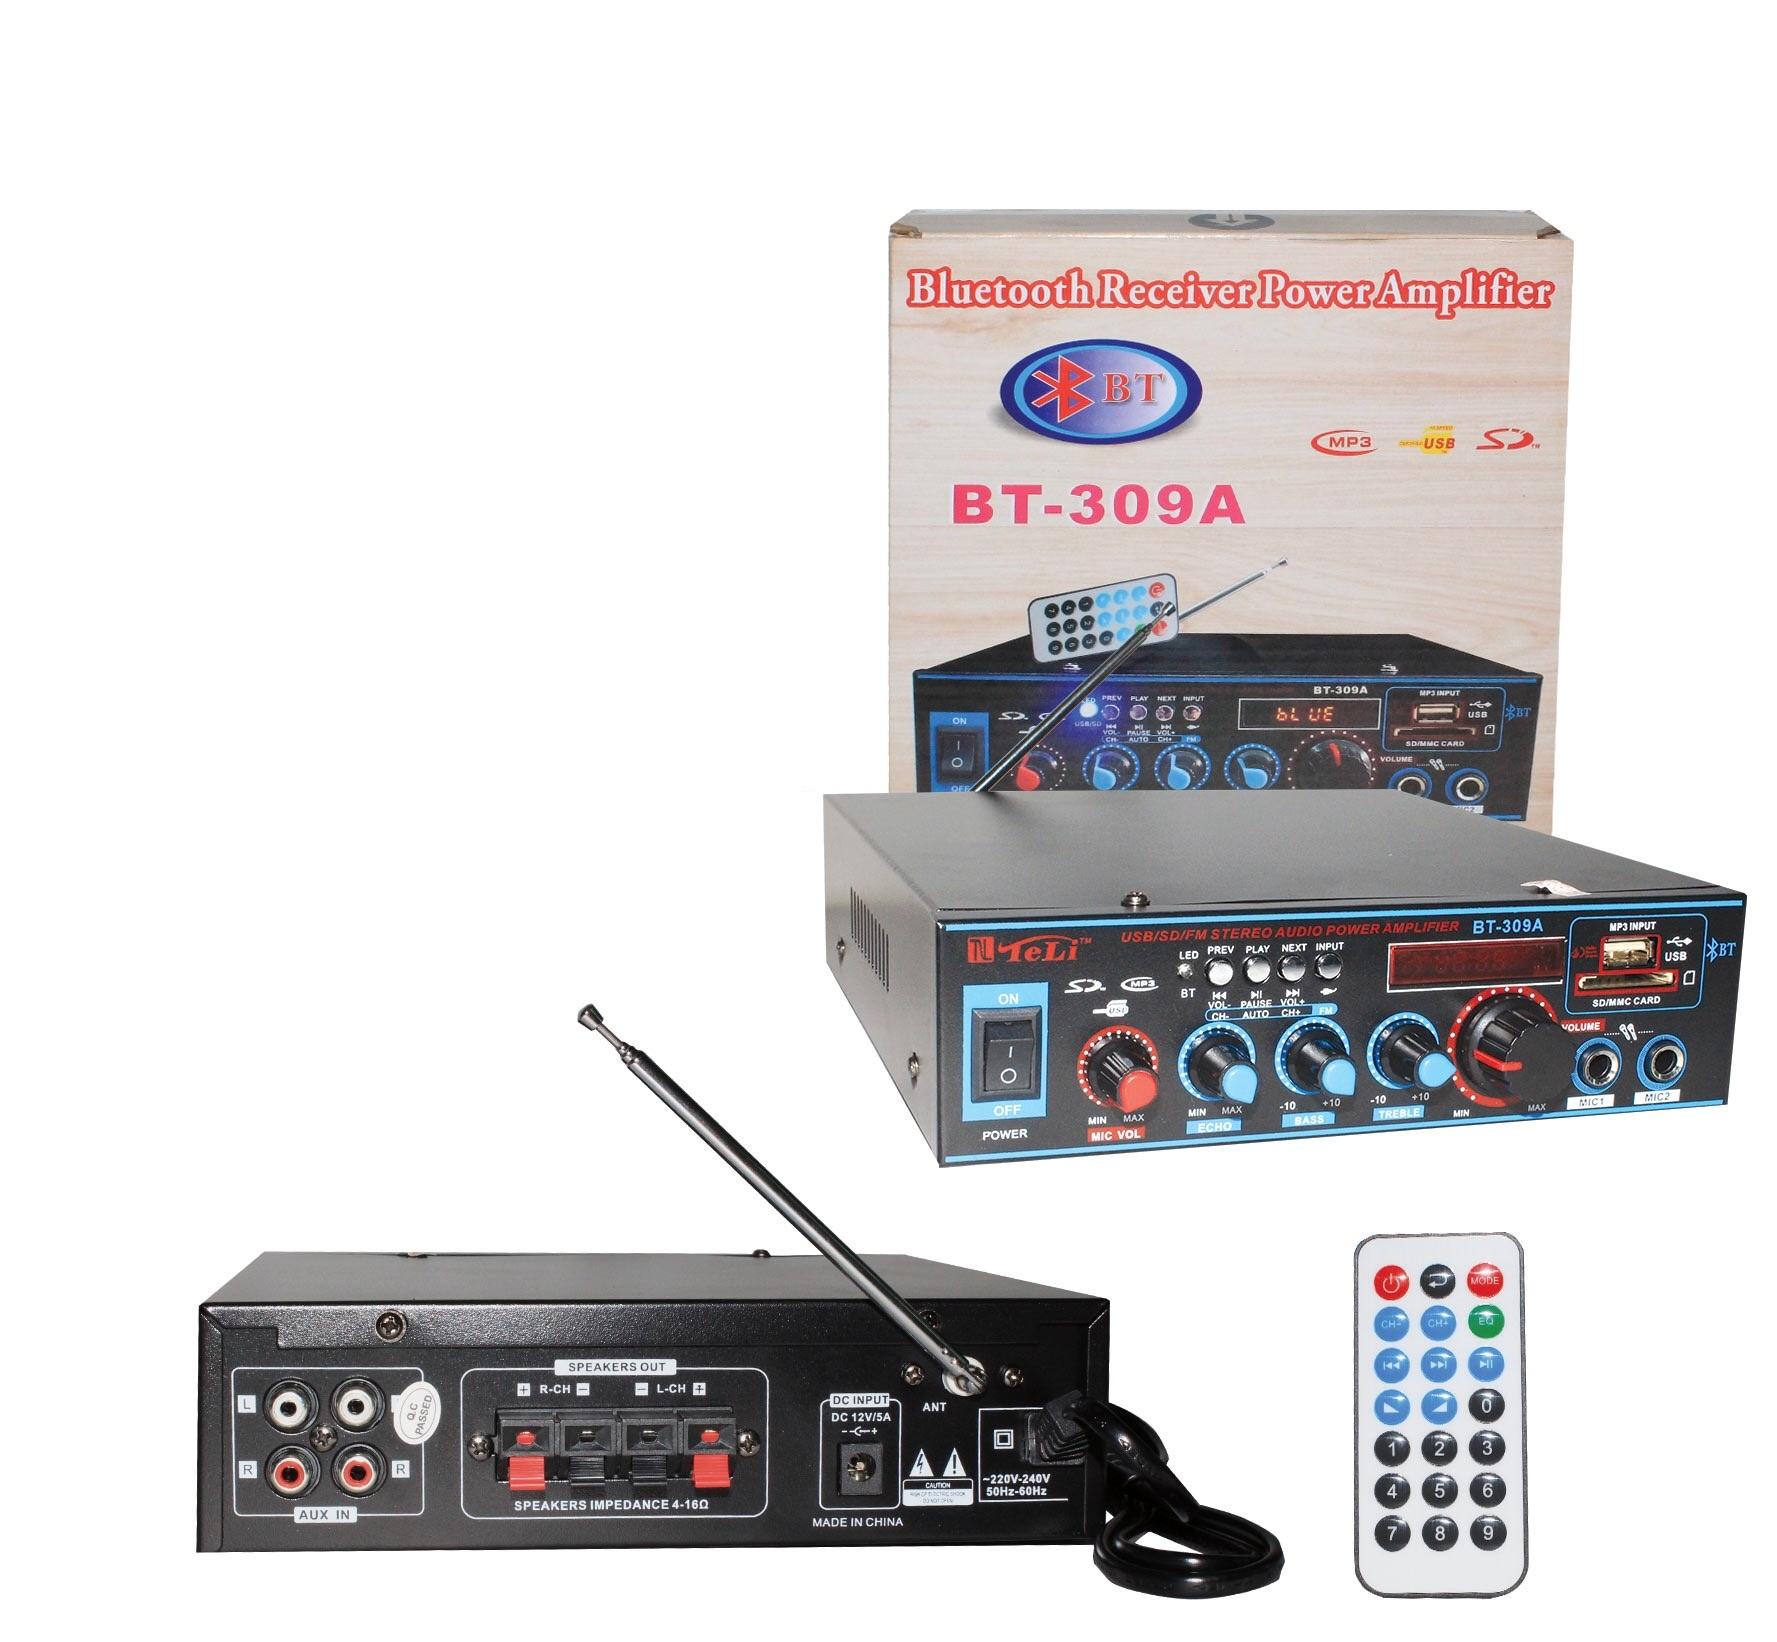 AMPLY MINI KARAOKE BLUETOOTH TELI BT-309A NGUỒN AC / DC